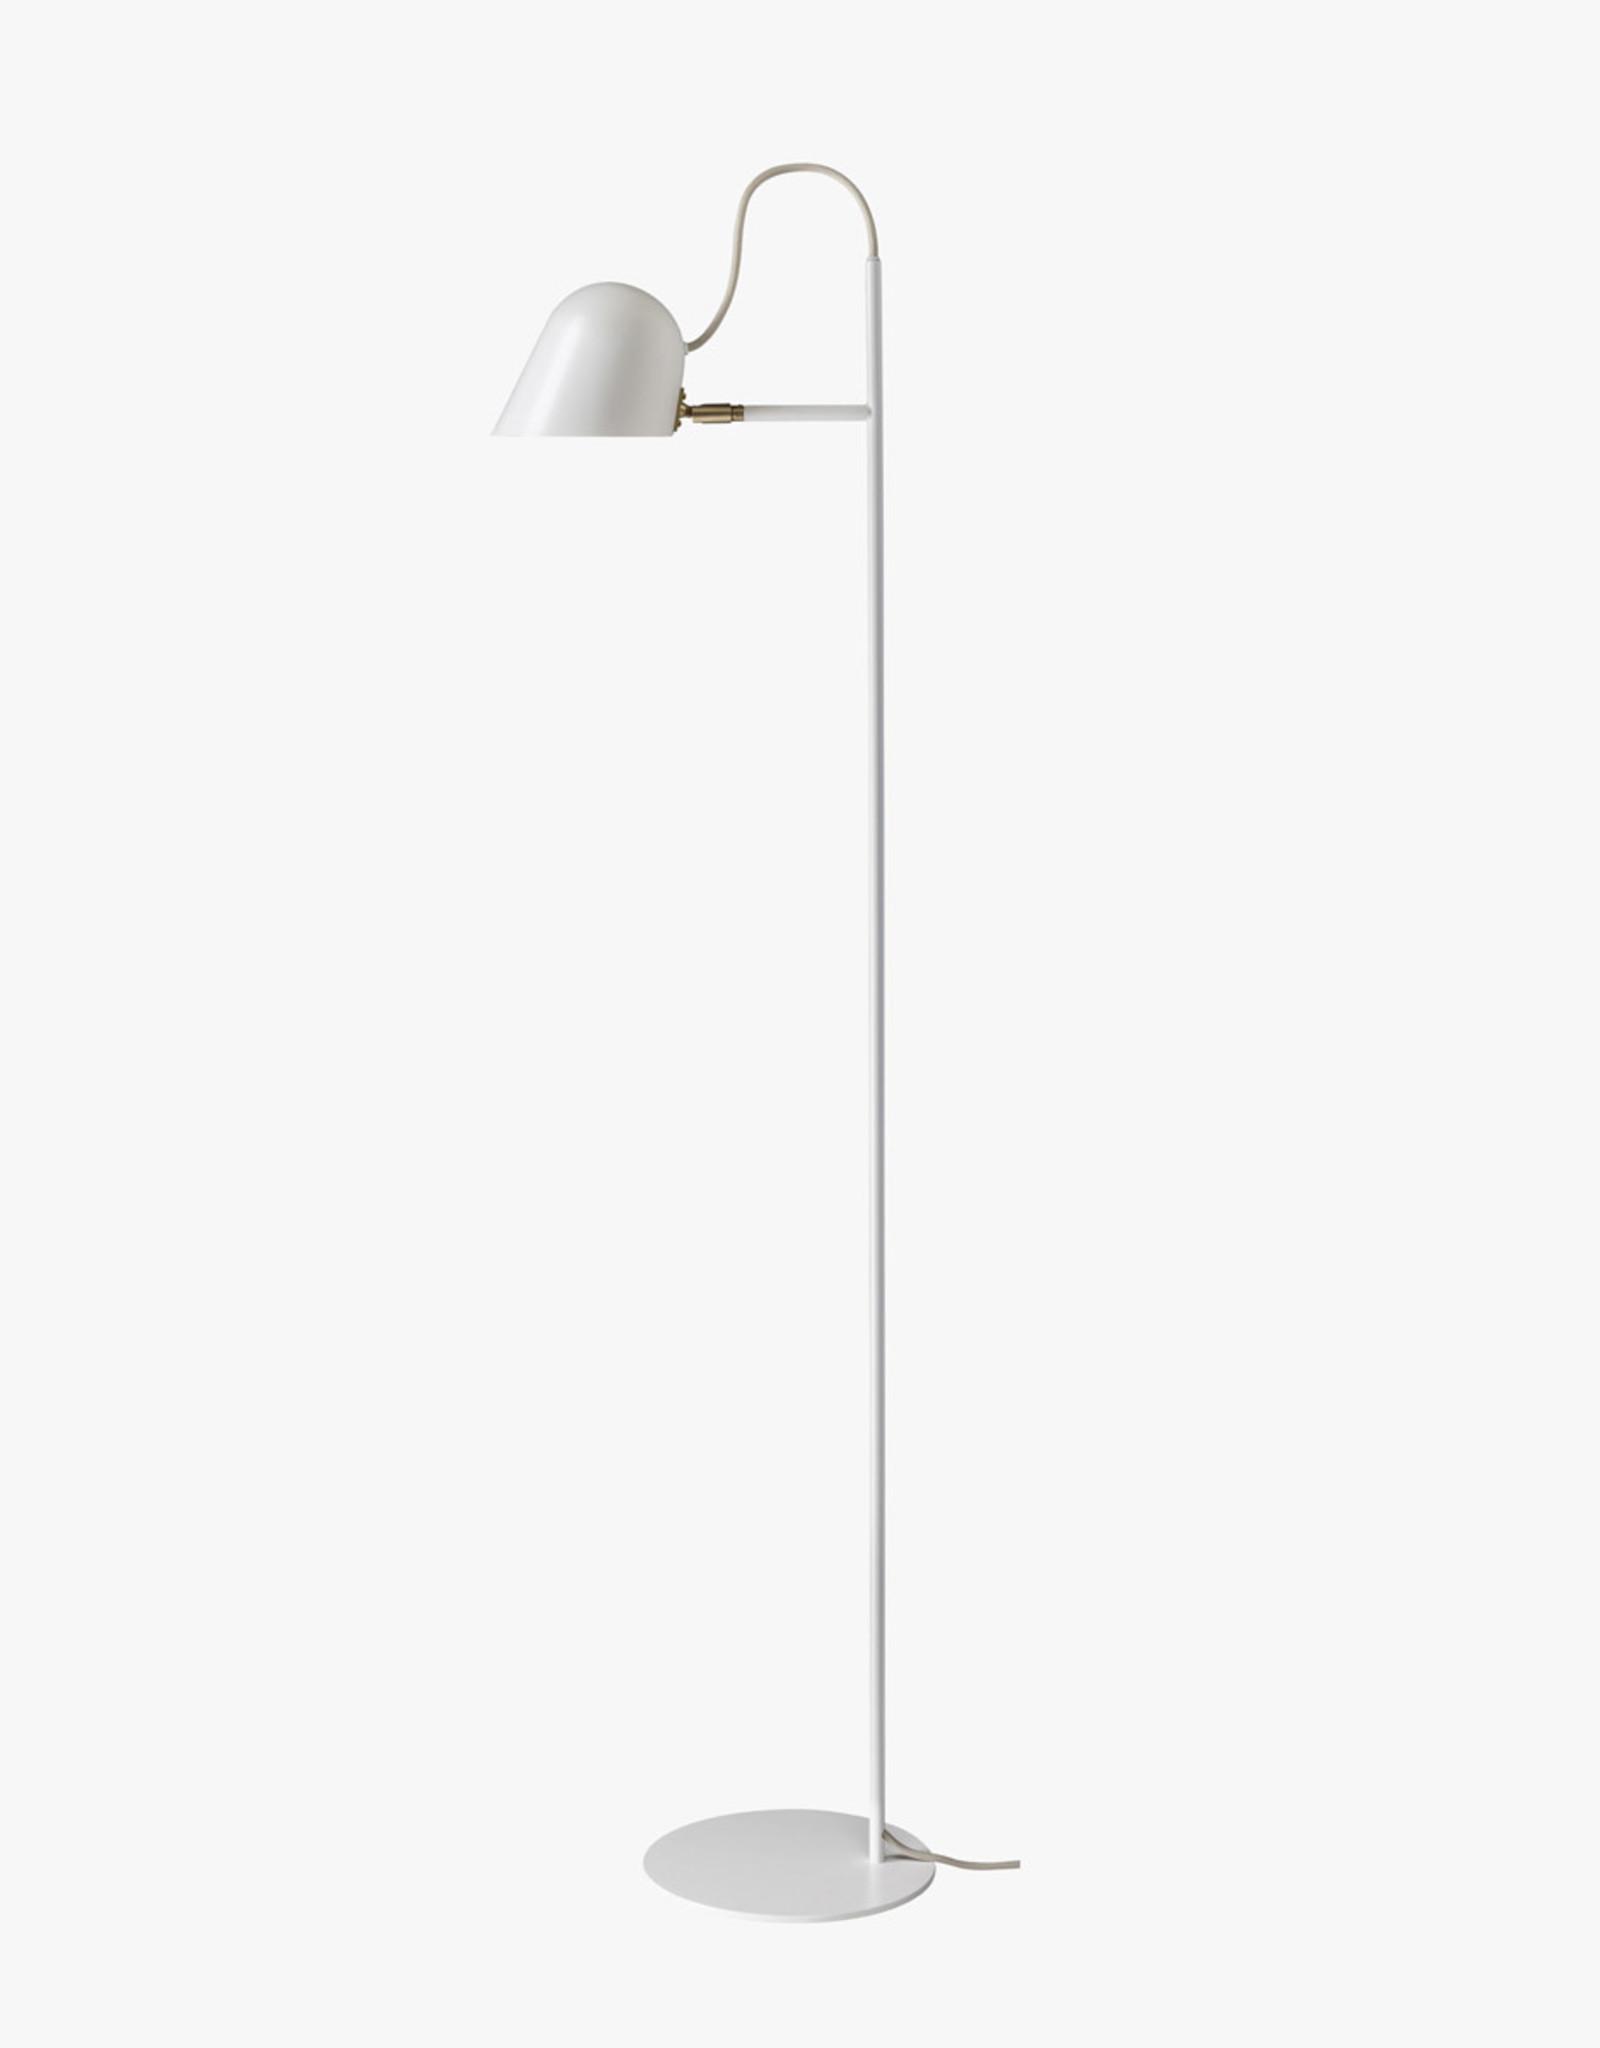 Streck floor light by Joel Karlsson | White/brass